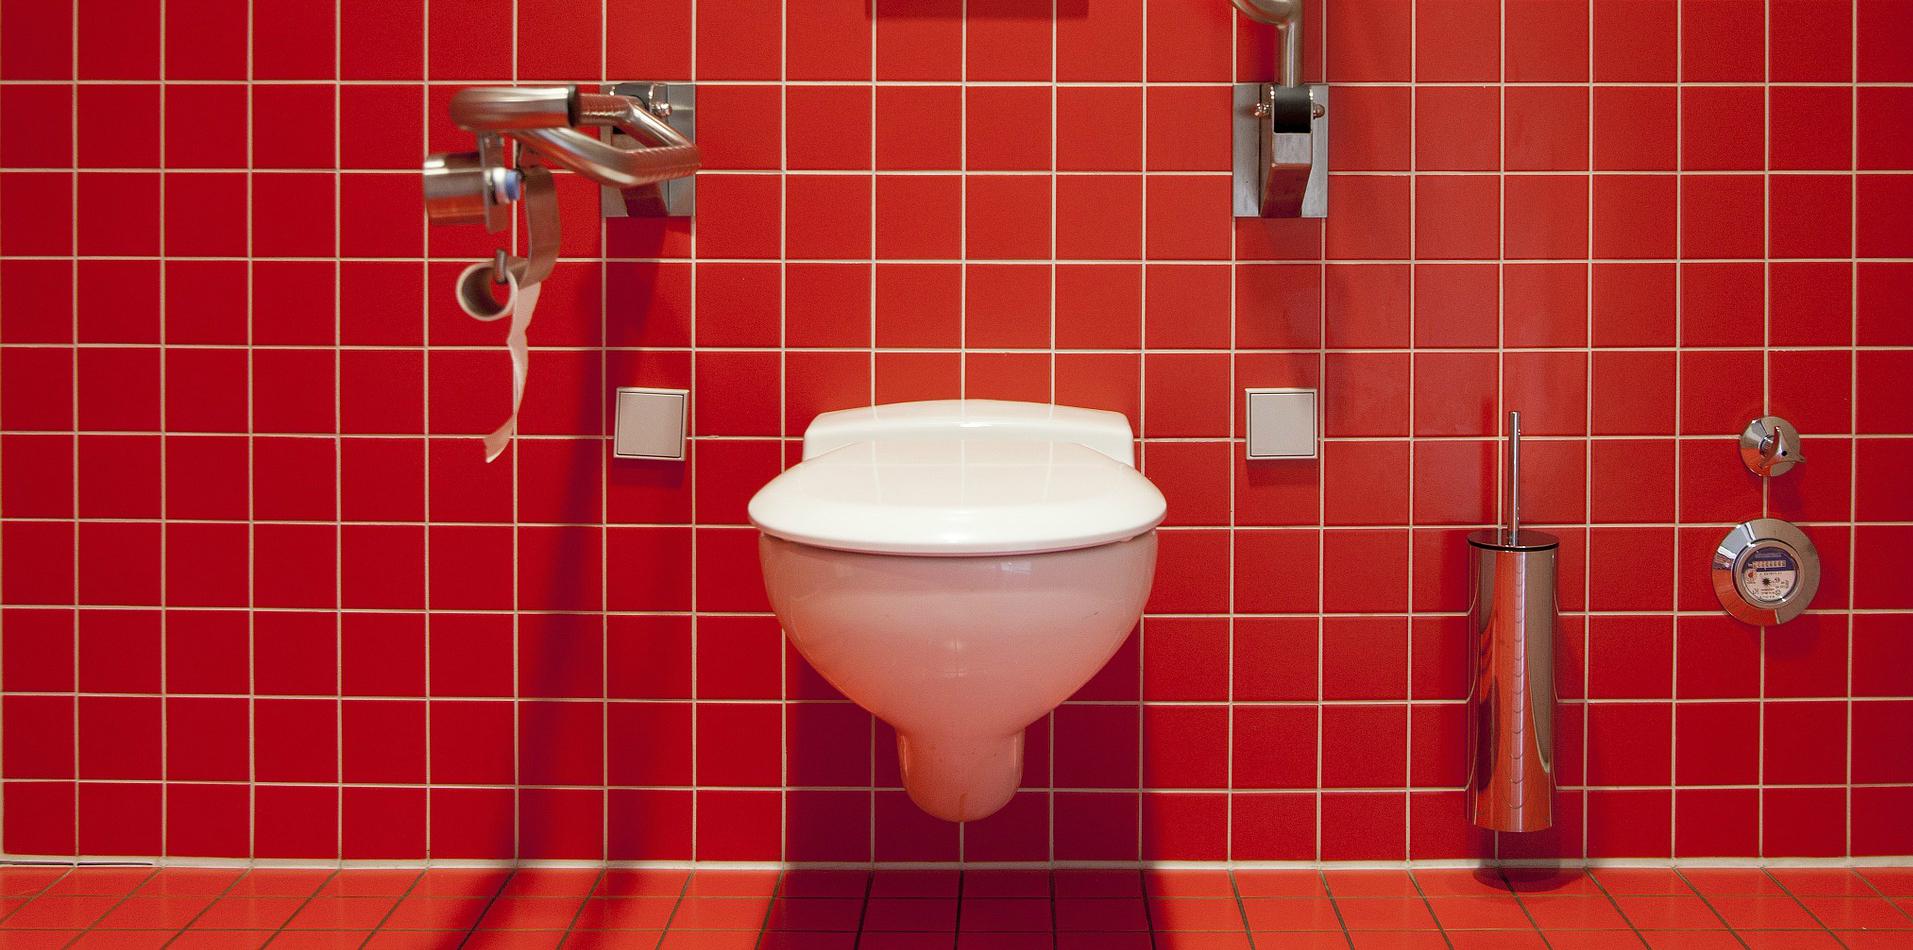 9-toilet-cleaning-hacks-that-work-2020